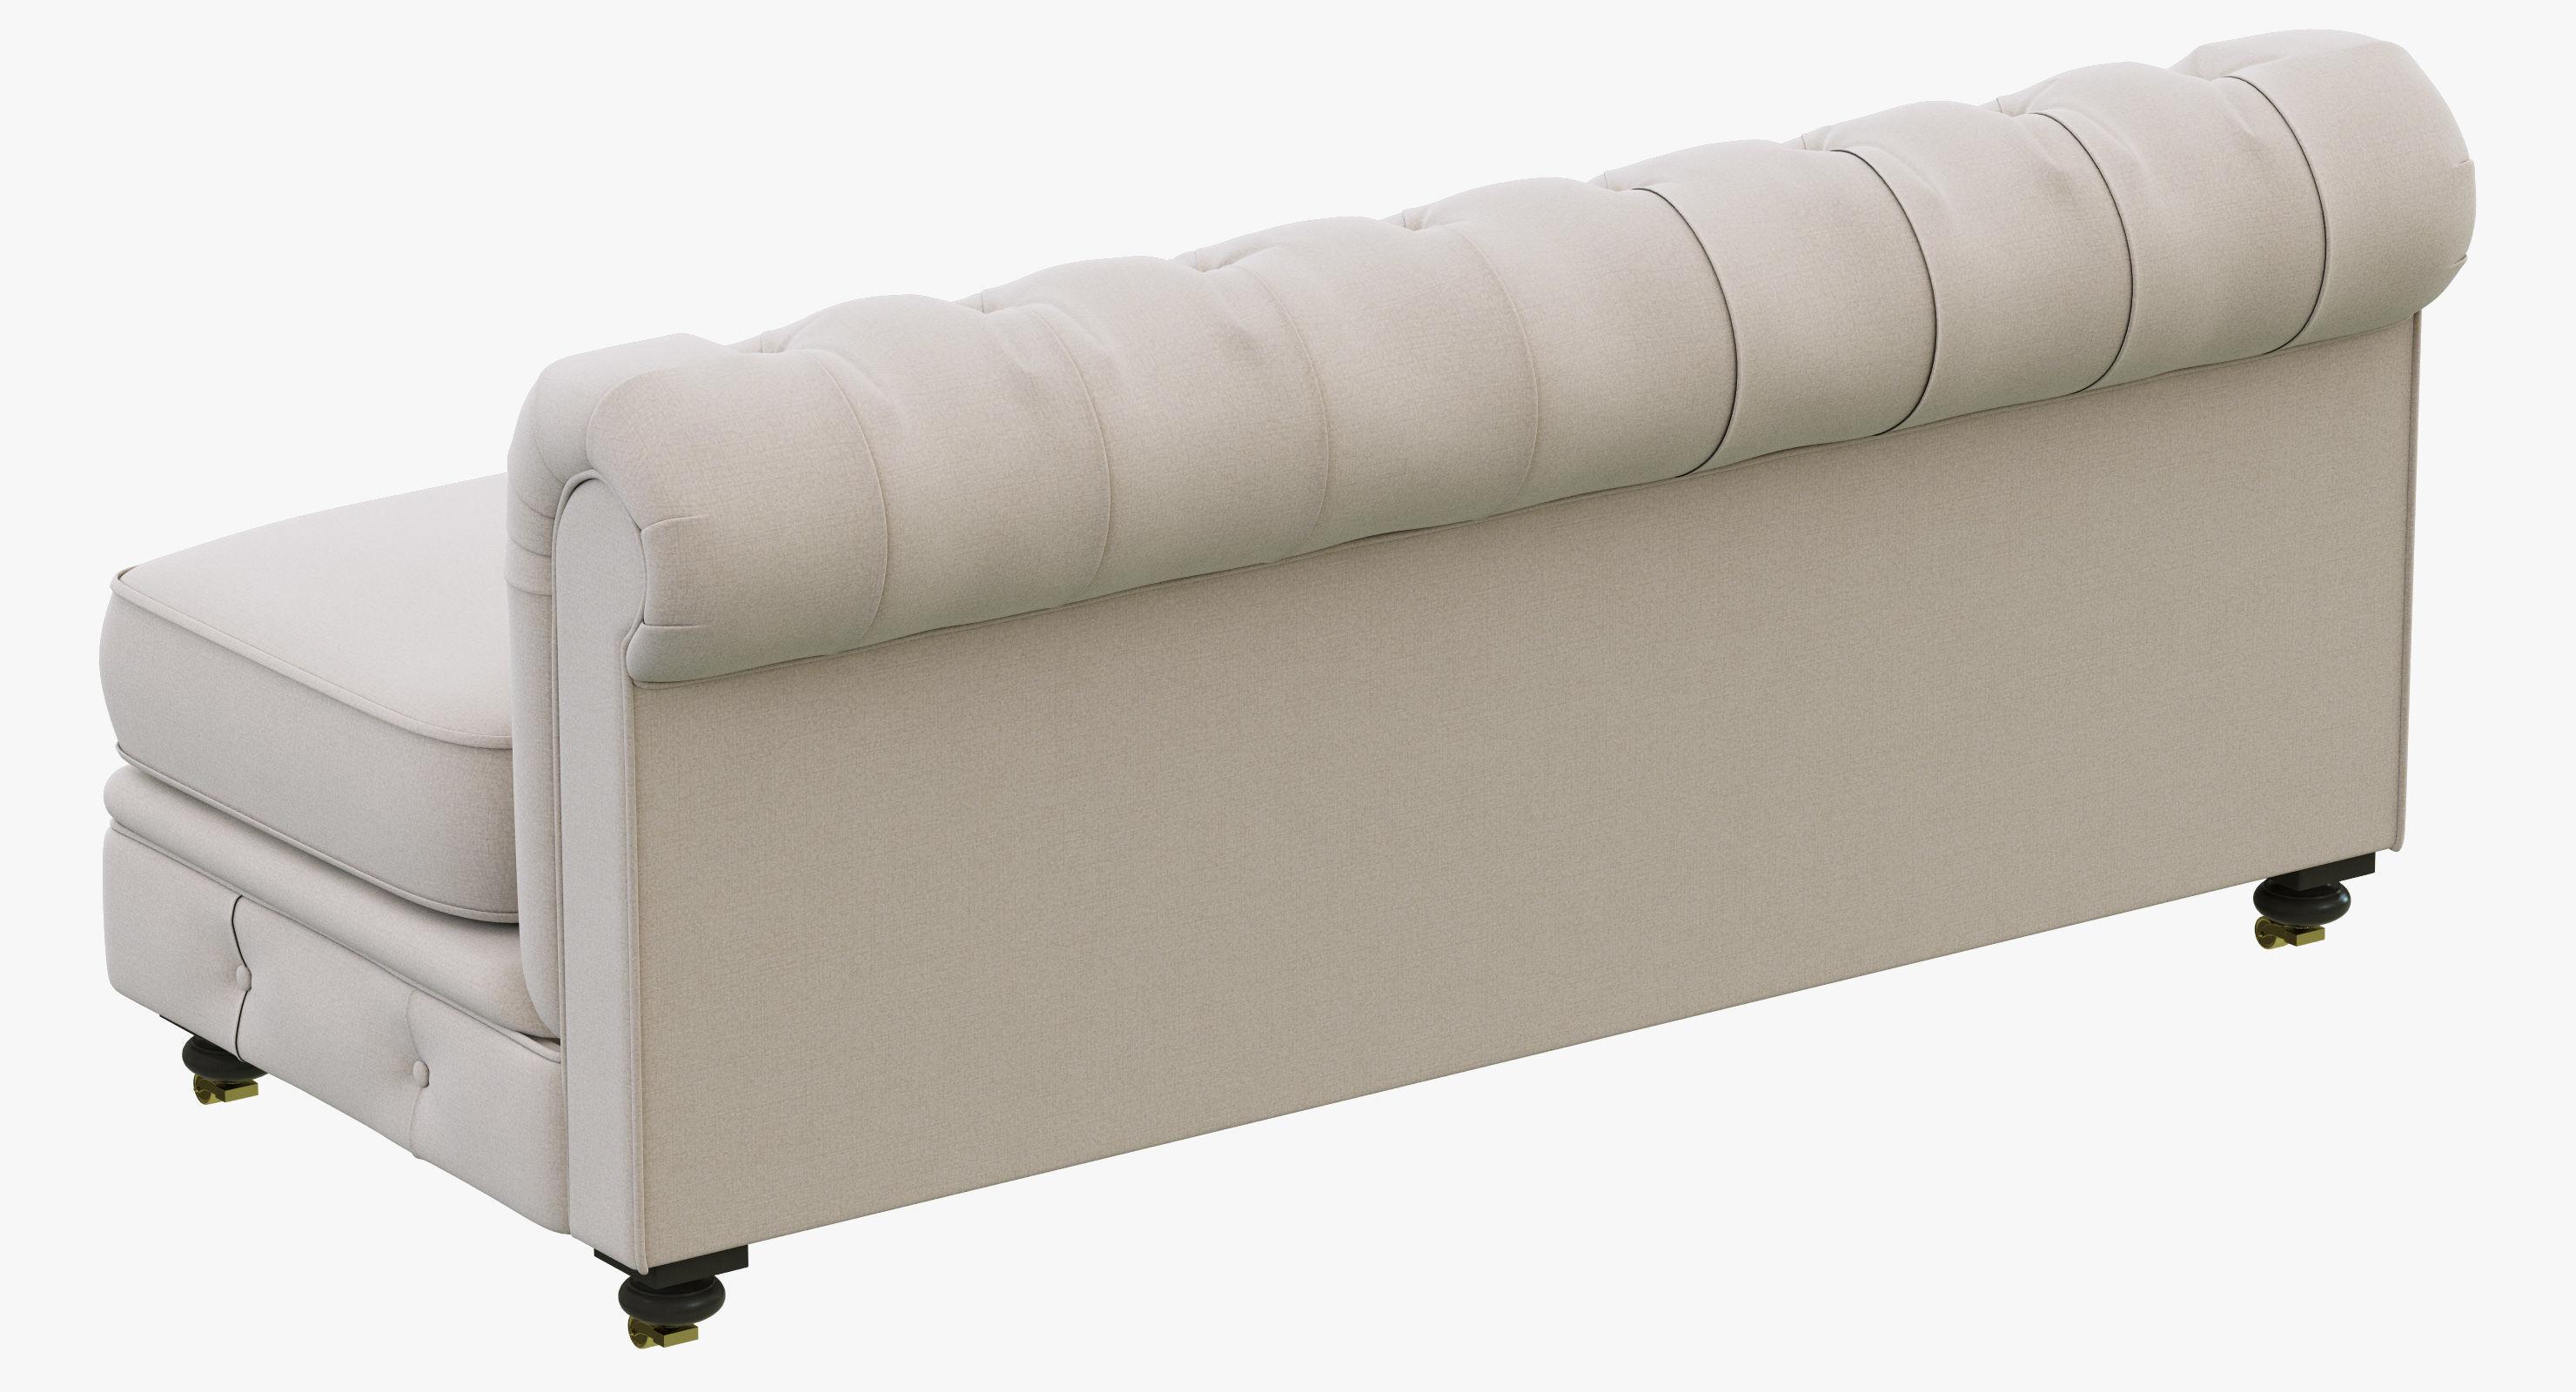 restoration hardware kensington sofa 106 bed queen mattress upholstered armless